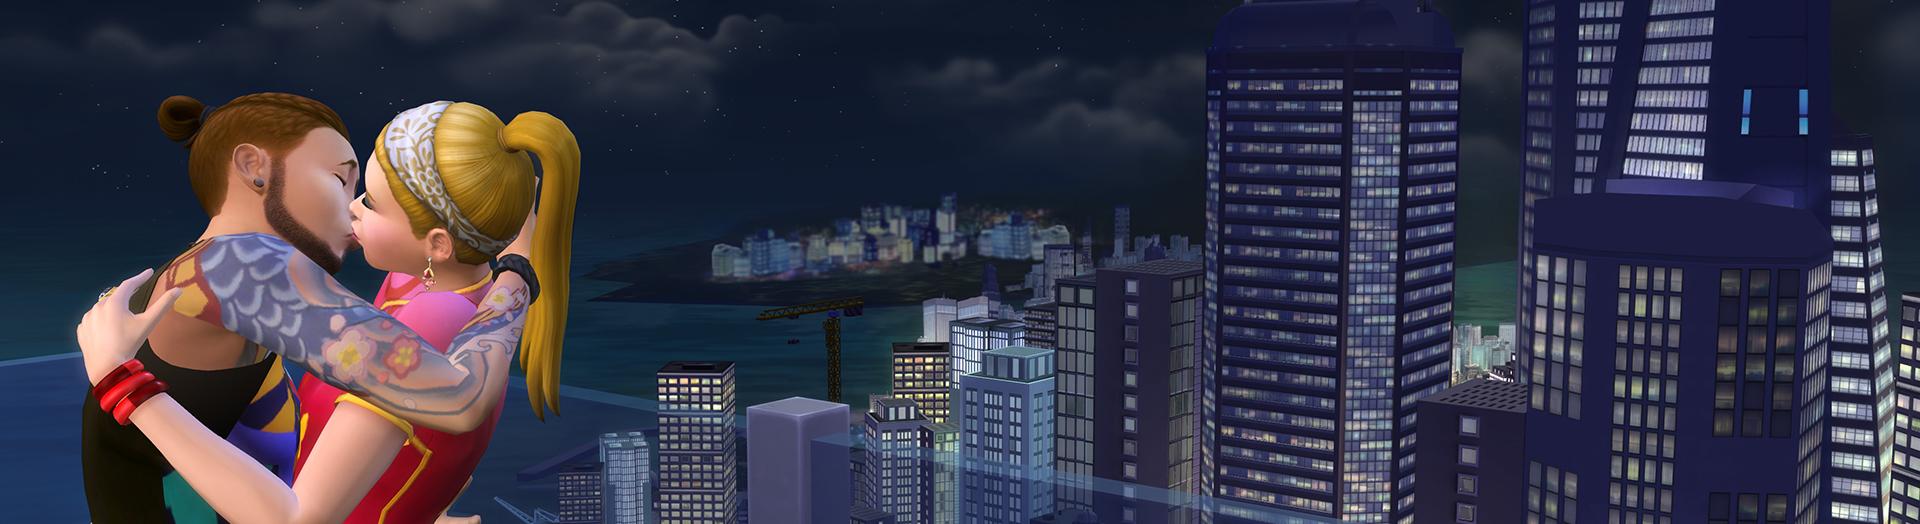 cityliving1